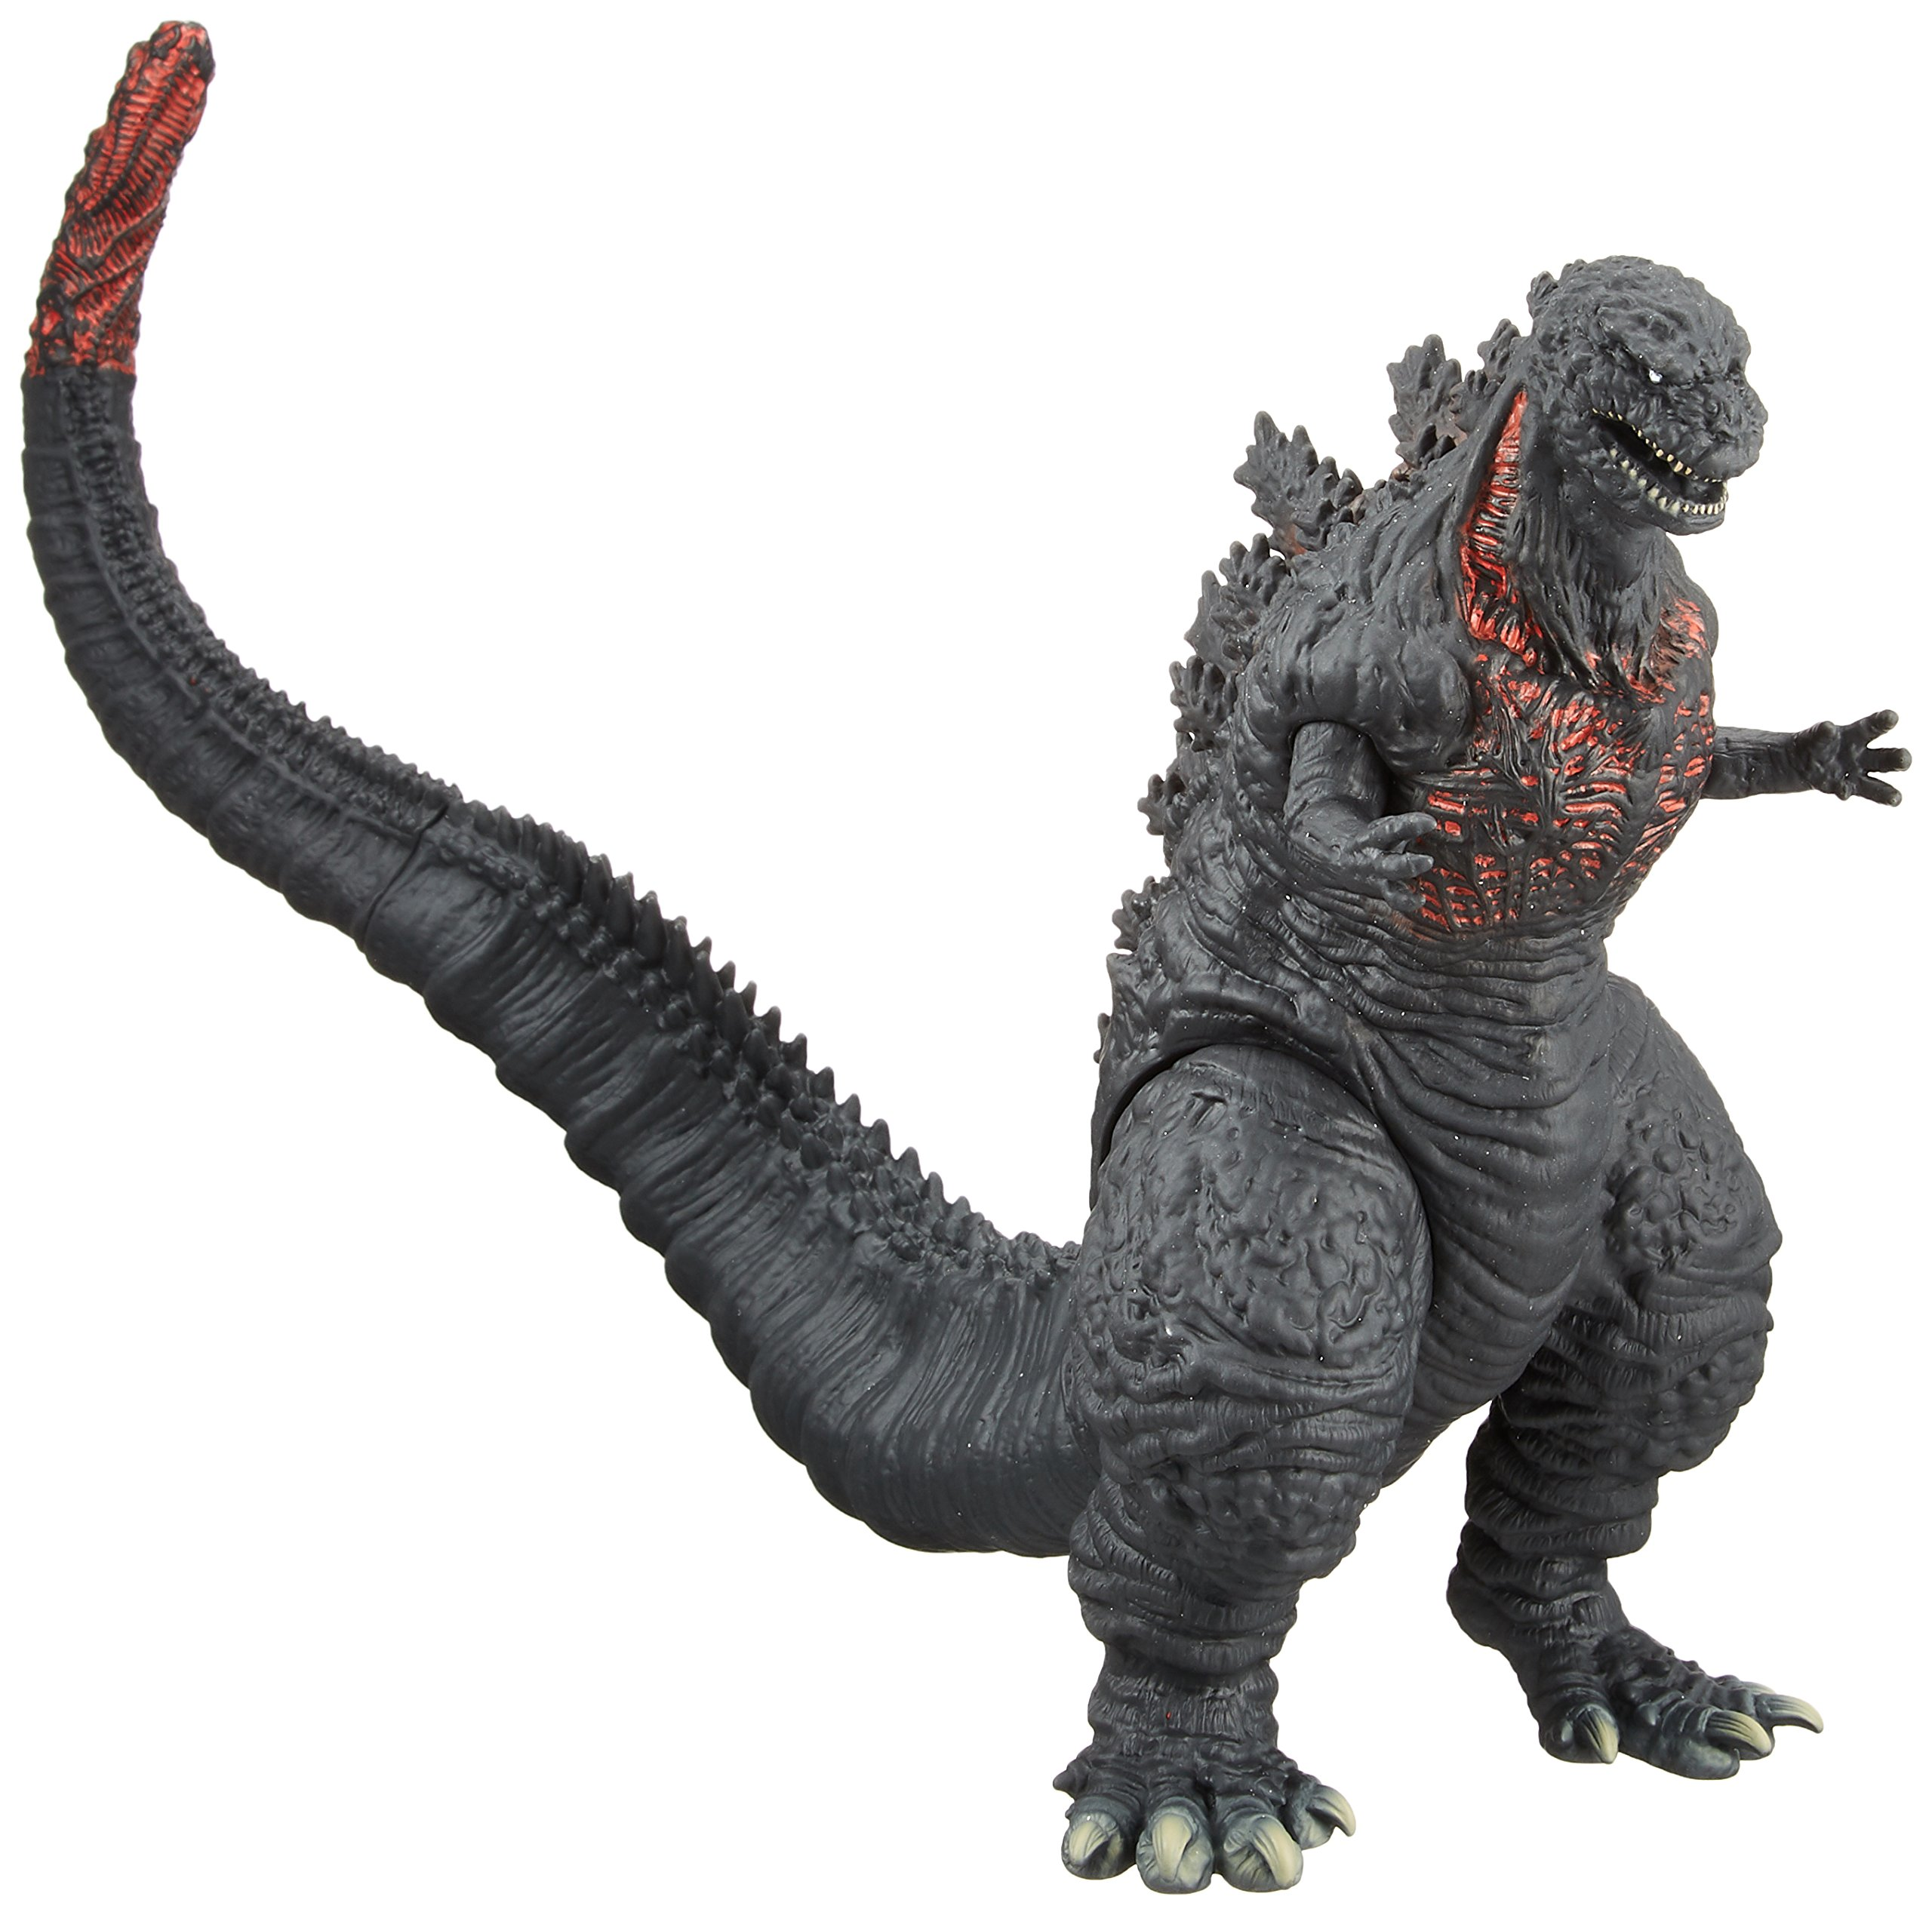 Bandai Movie Monster Series Godzilla 2016 Vinyl Figure (Japan Import)